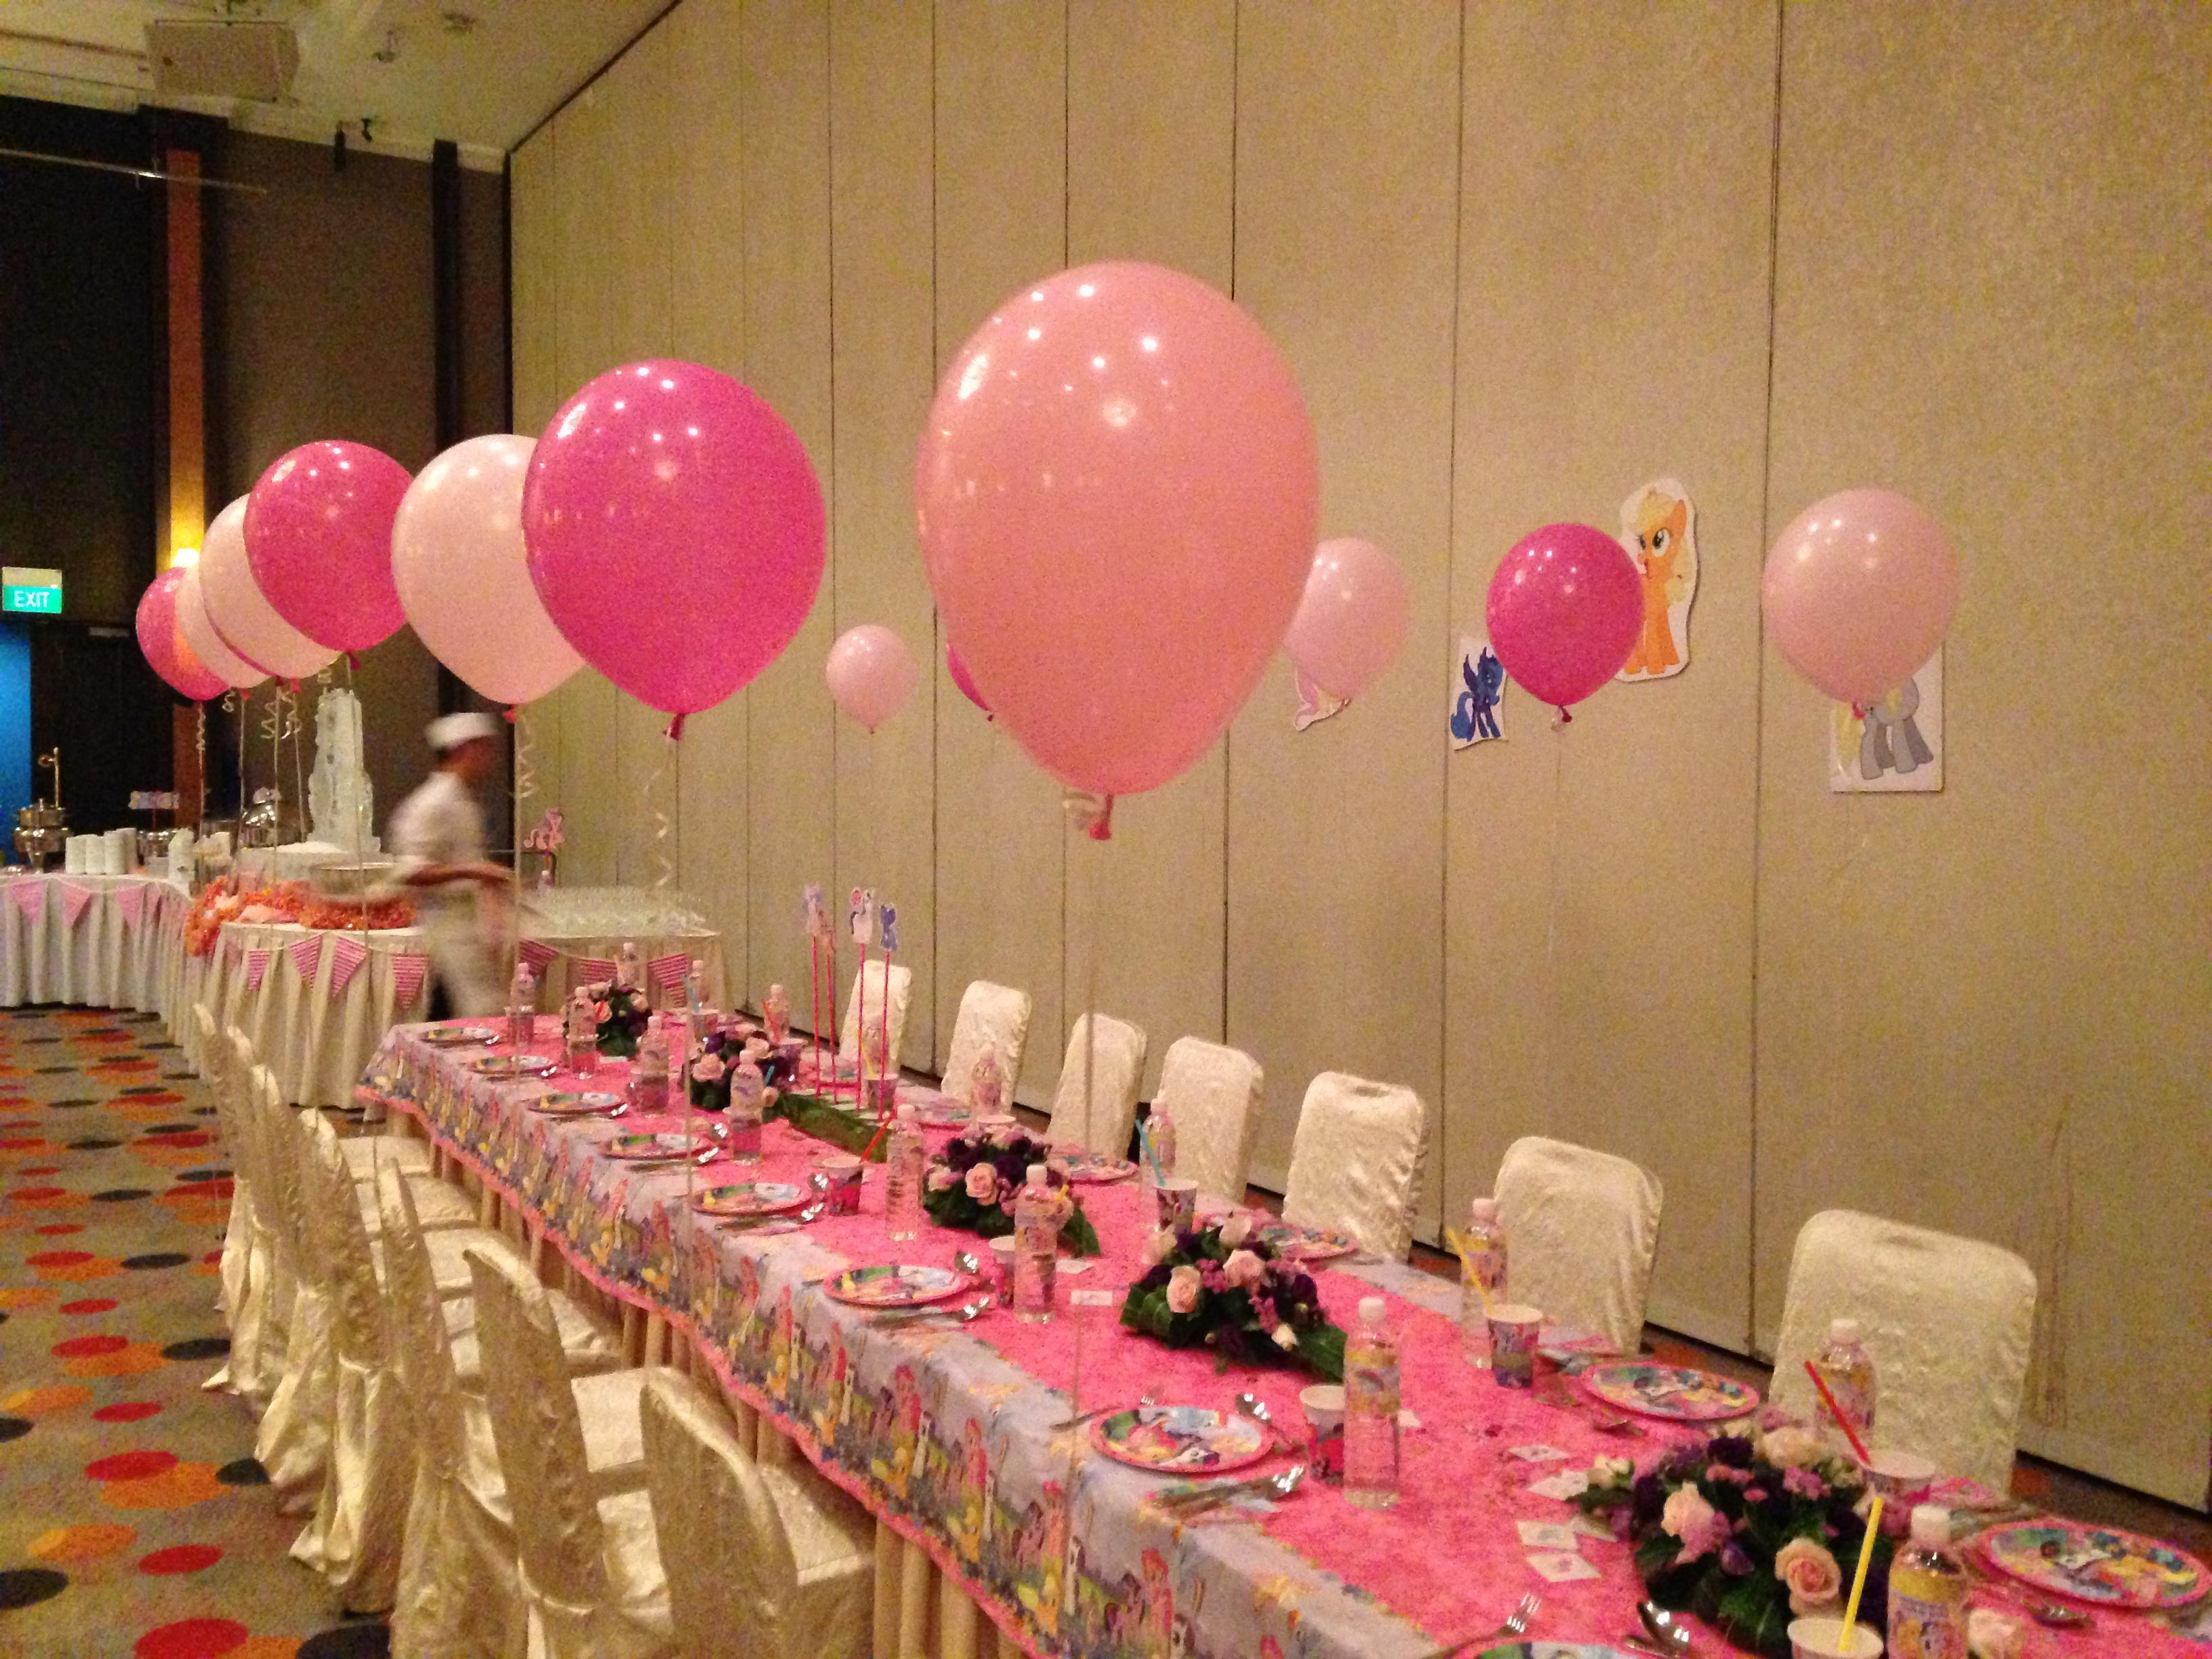 Pink helium balloons